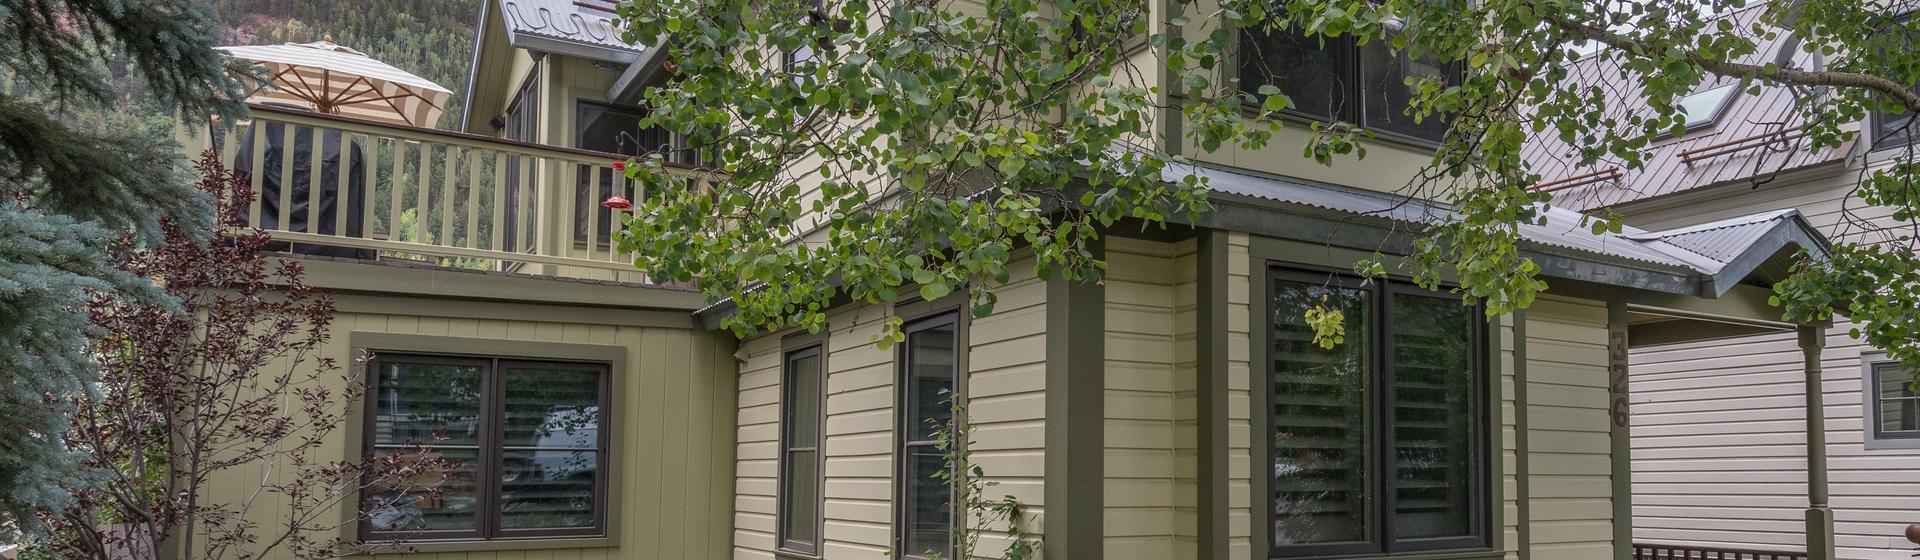 16-Telluride-Ajax-Exterior-Deck-Street-Level-Web.jpg